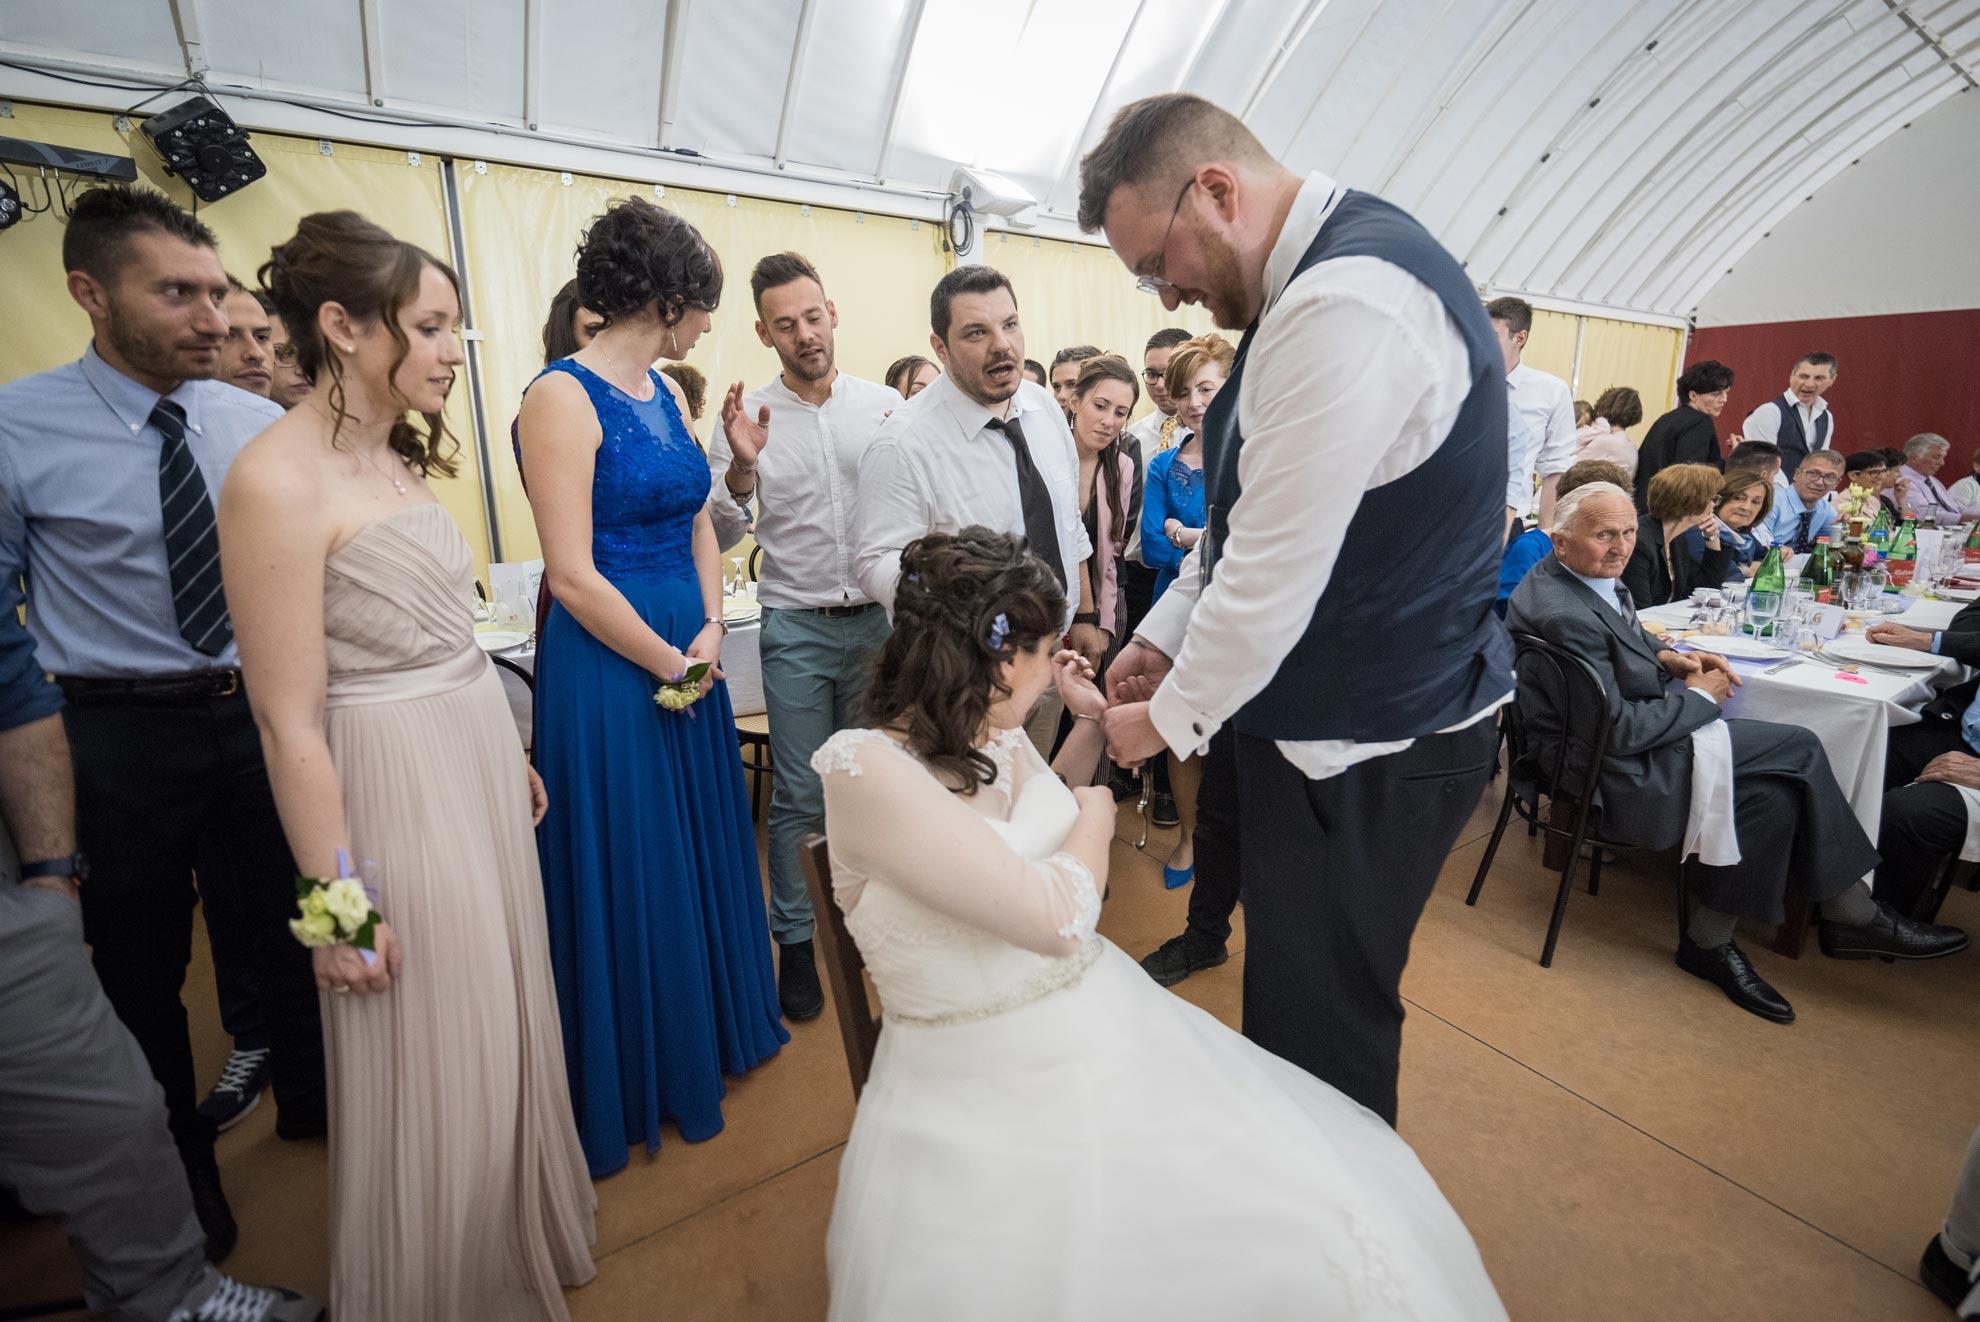 Matrimonio a Narzole Lorenza Diego - DSC 0852 - Fotografo matrimonio nelle Langhe festa - Fotografo matrimonio nelle Langhe festa